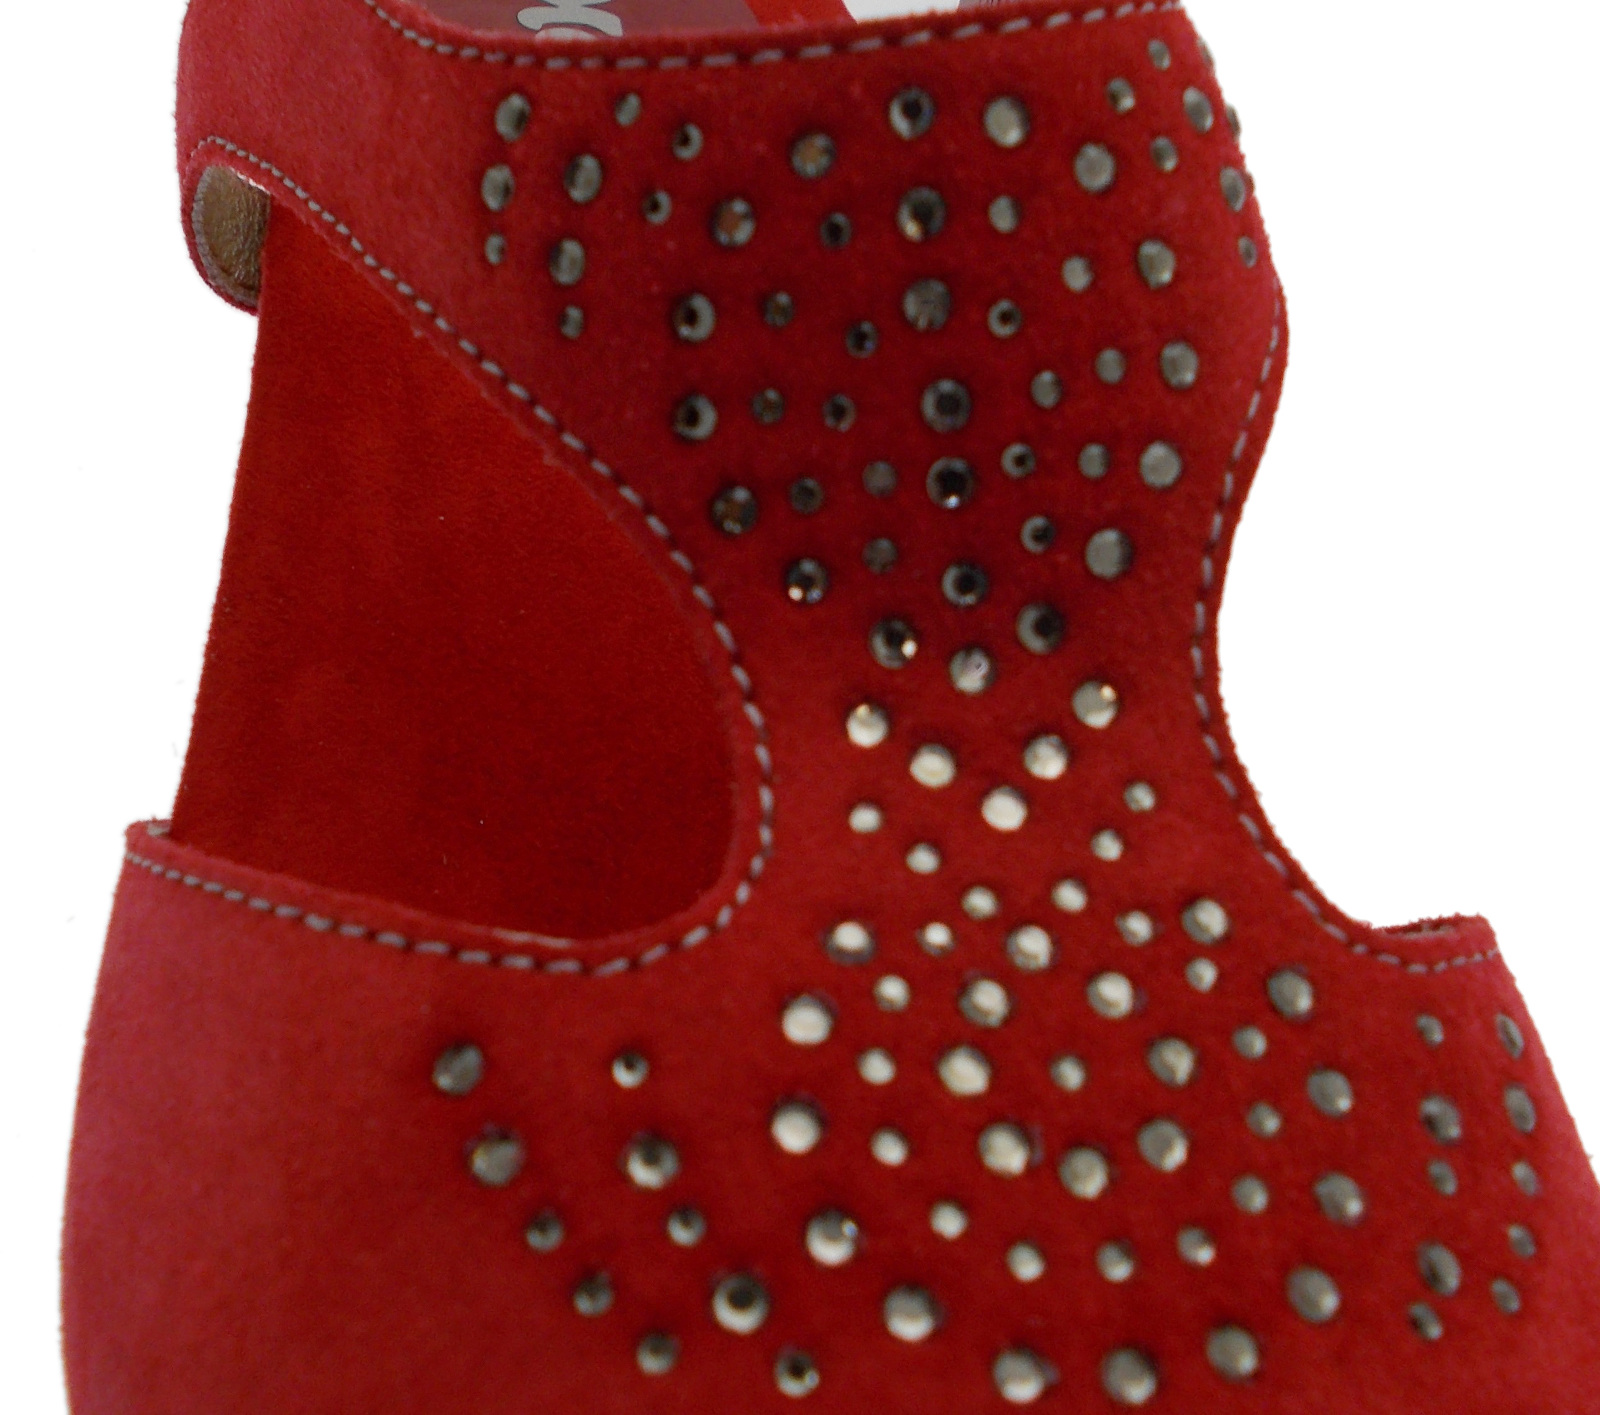 sandalo-donna-aperto-rosso-zeppa-art-K95015-Melluso